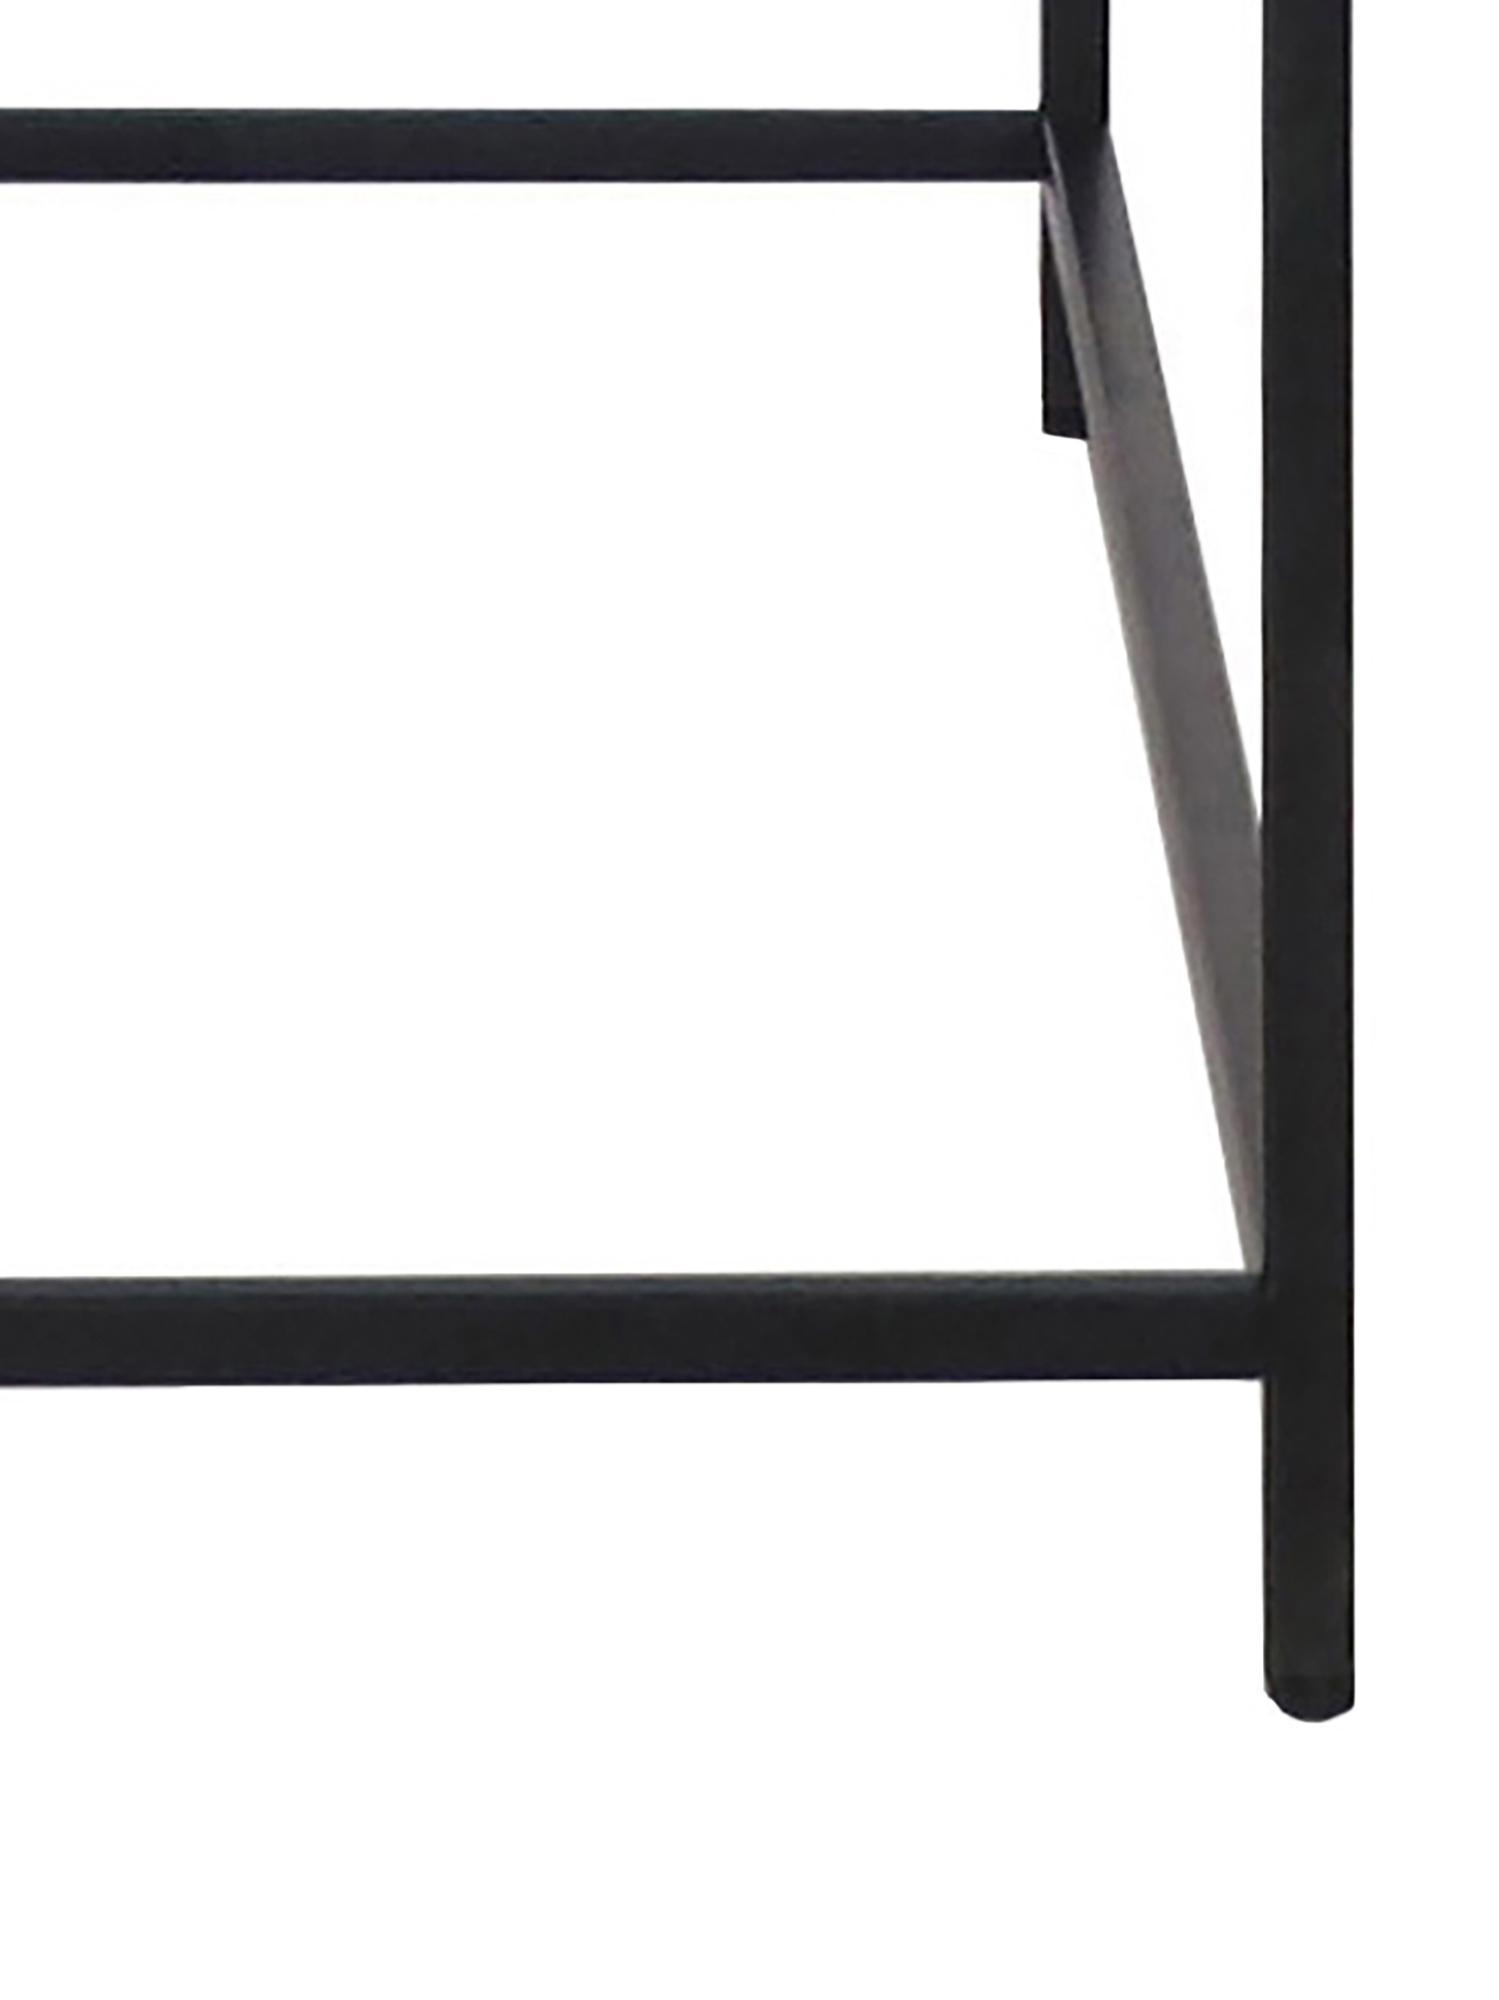 Consolle Newton, Metallo verniciato, Nero, Larg. 100 x Alt. 79 cm